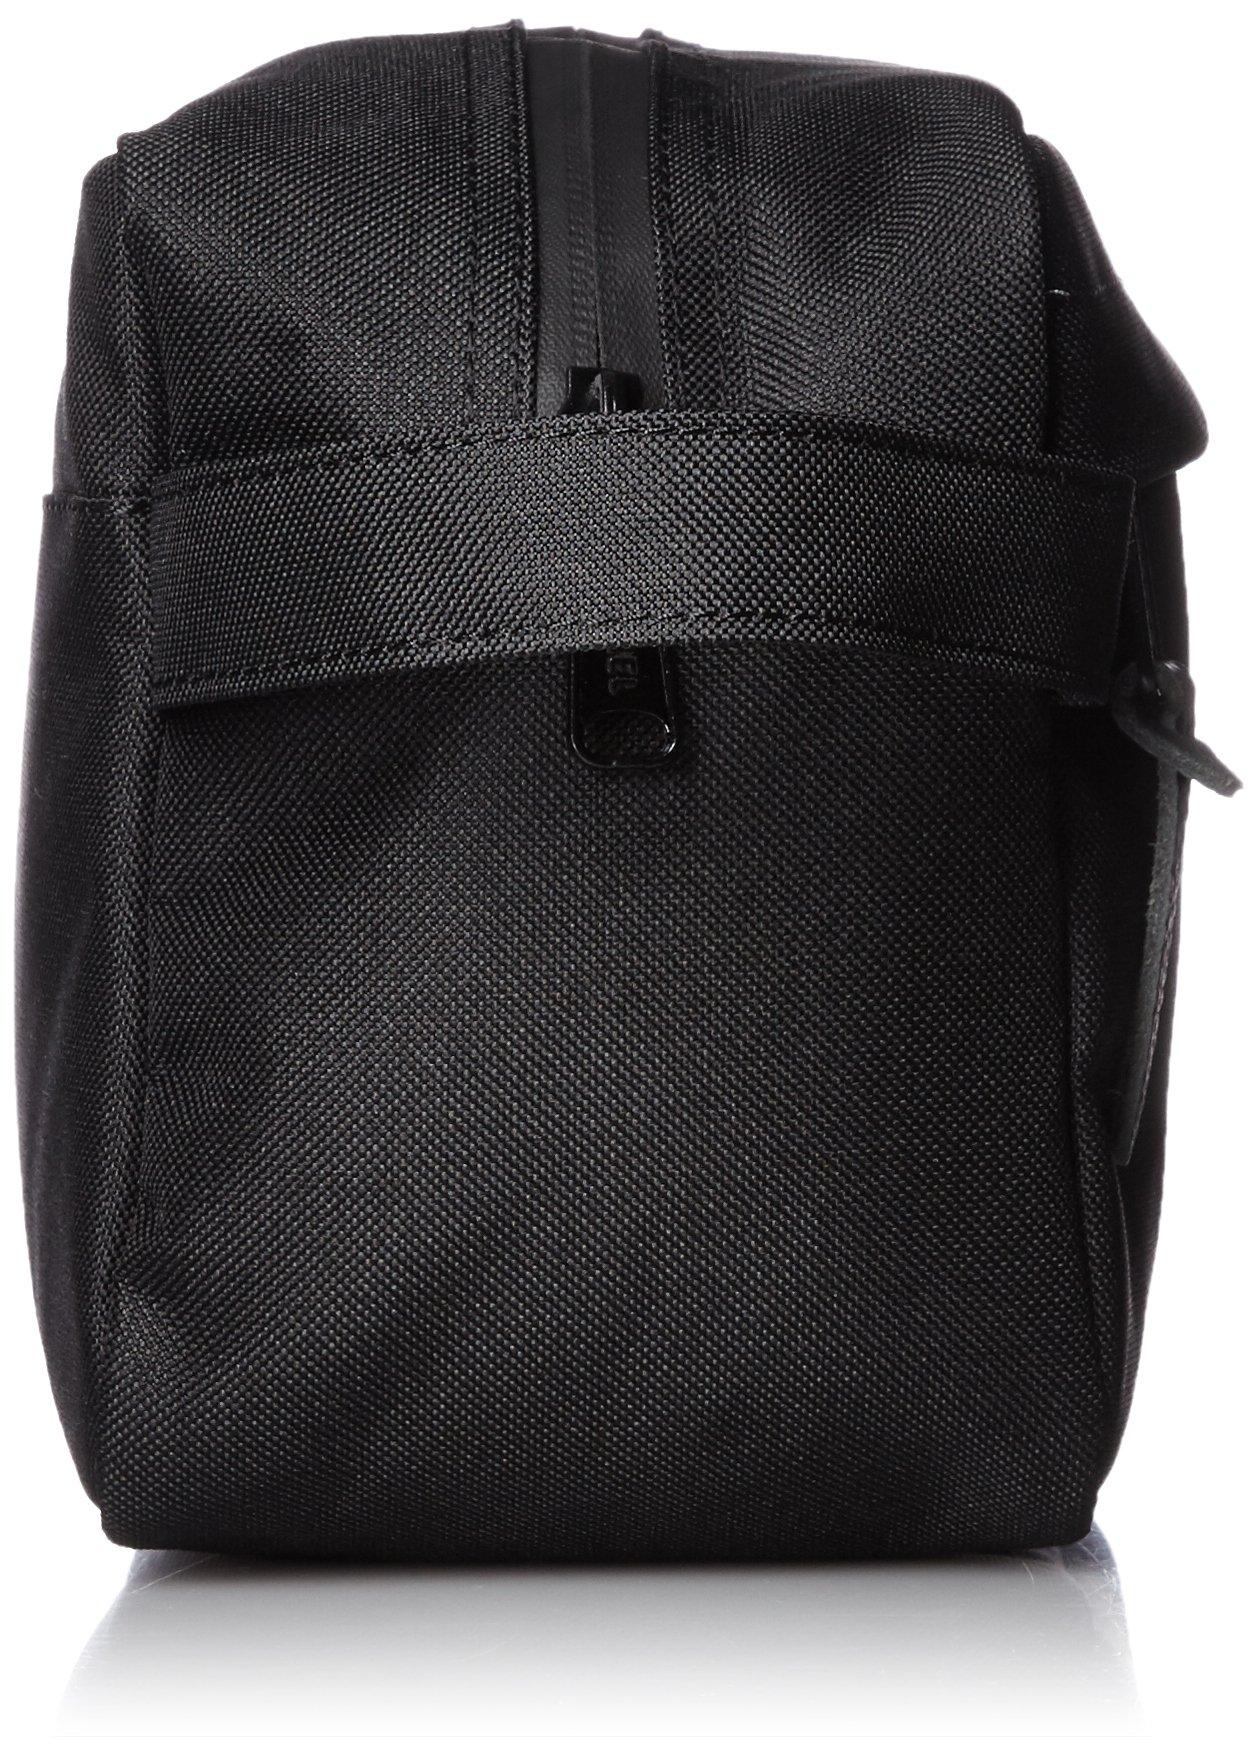 Herschel Supply Co. Chapter Travel Kit,Black,One Size by Herschel Supply Co. (Image #6)